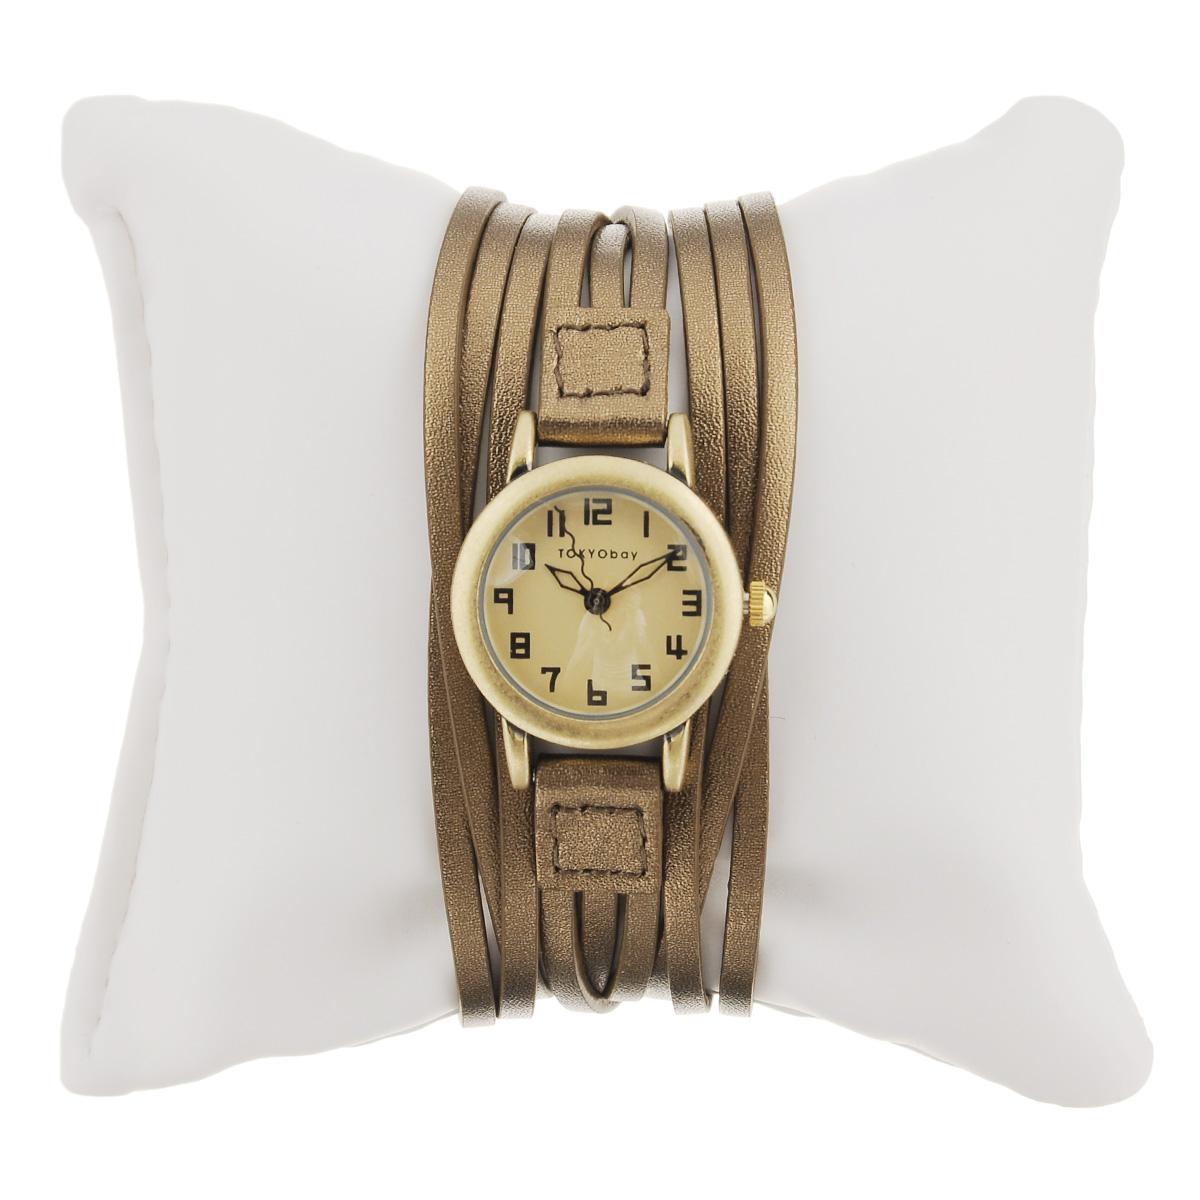 "Часы женские наручные Tokyobay ""Gaucho"", цвет: бронзовый. T432M-BZ ( T432M-BZ )"